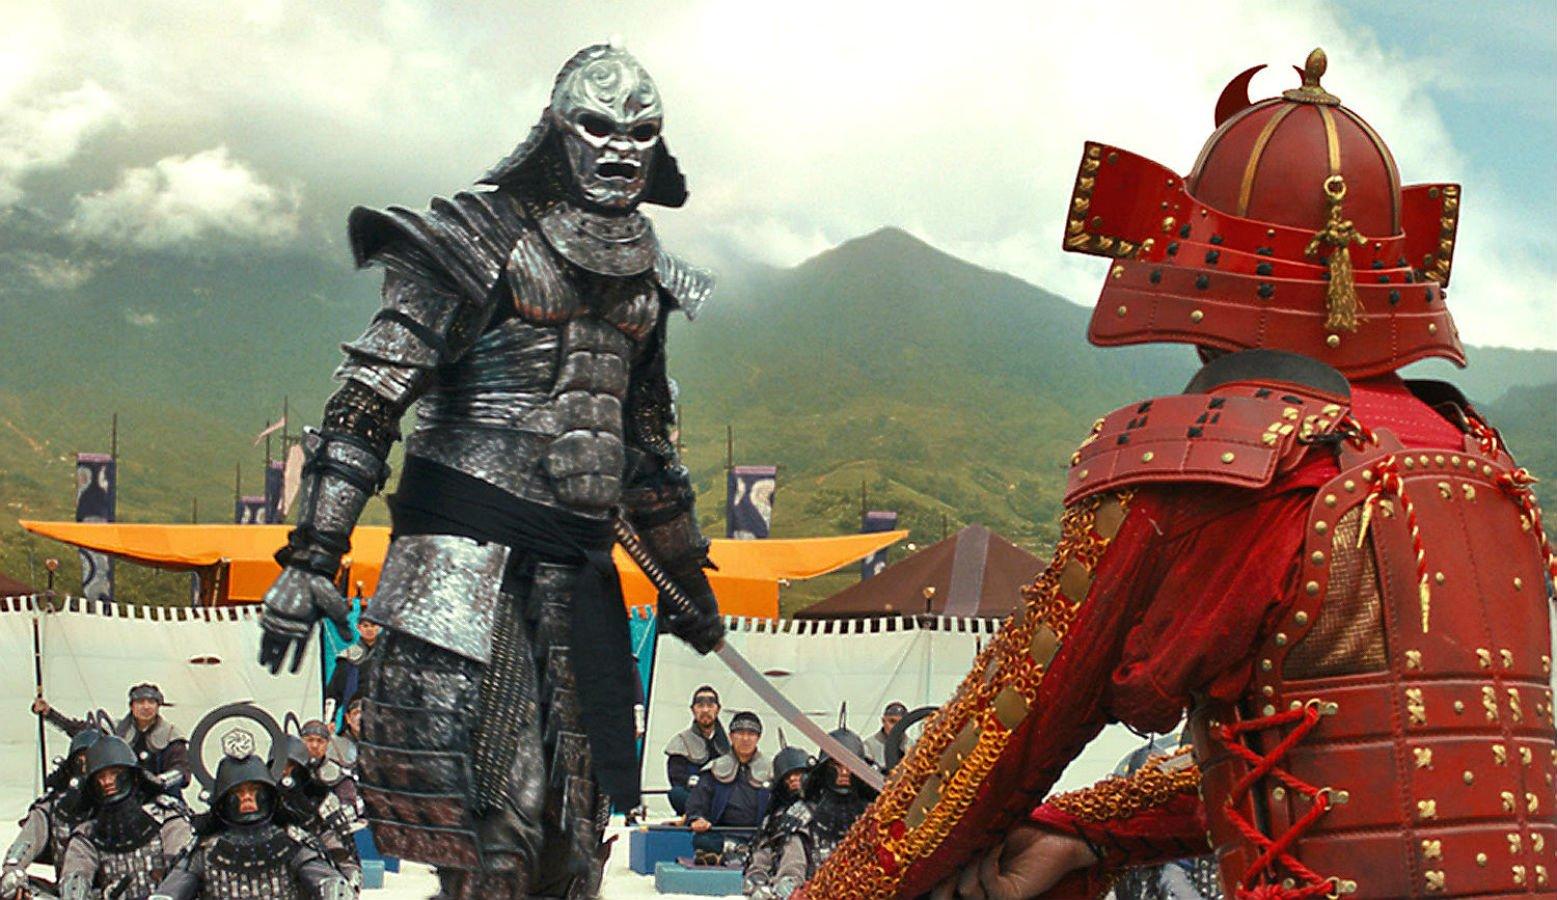 47-RONIN Action Adventure Fantasy Martial Arts Ronin